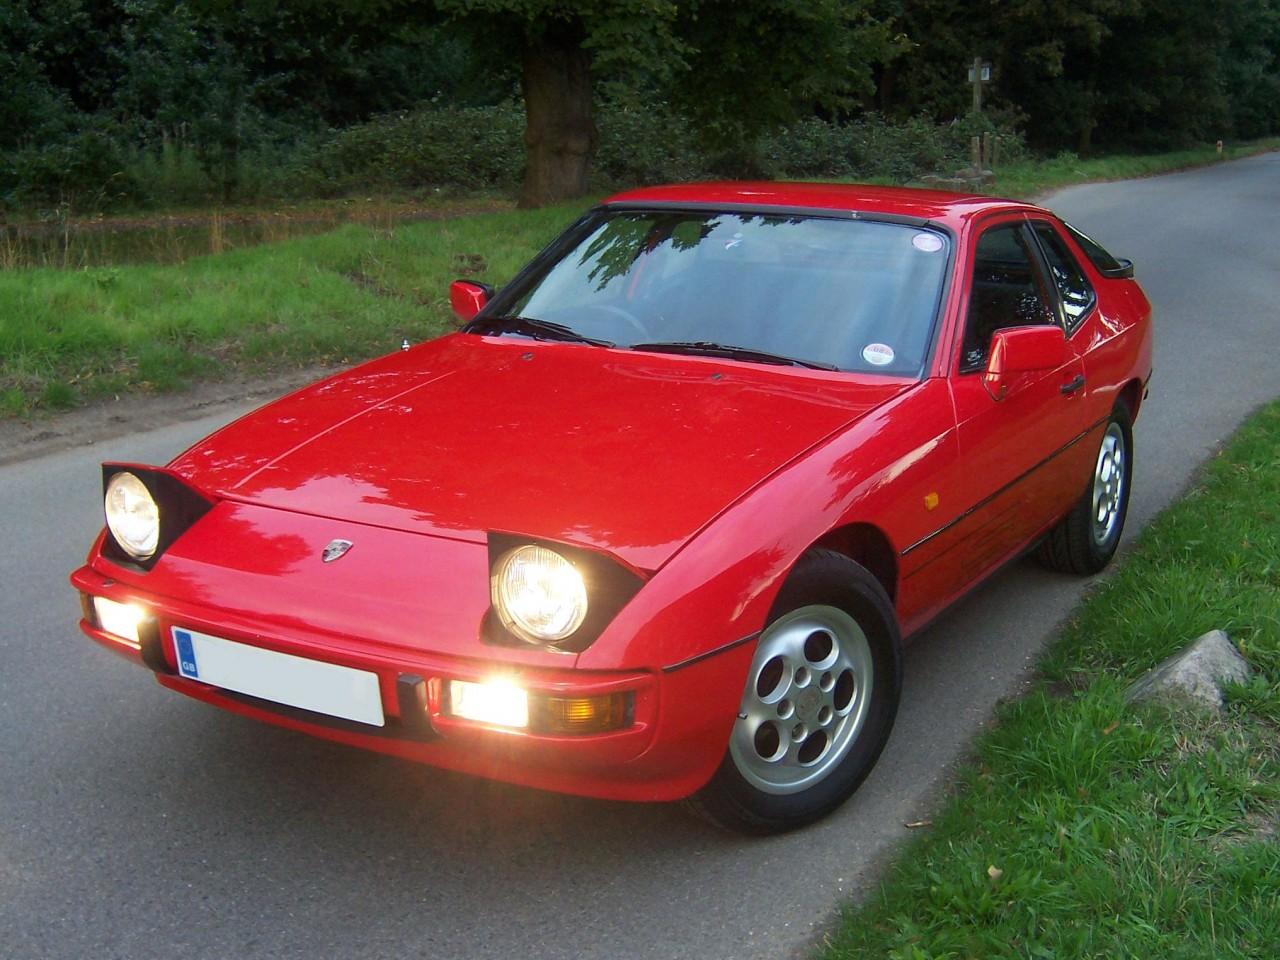 http://upload.wikimedia.org/wikipedia/commons/8/8d/Porsche924S.JPG